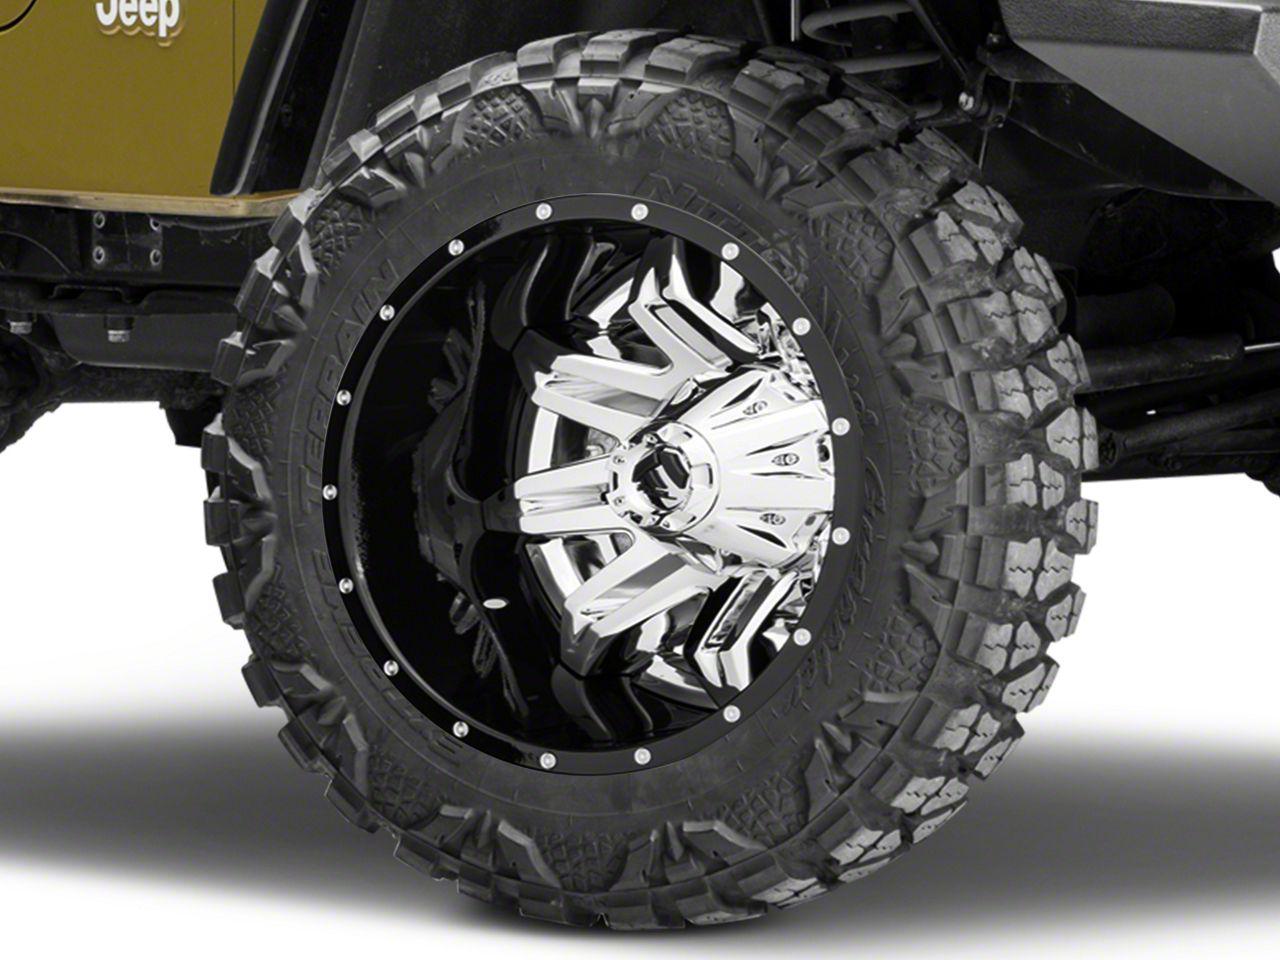 fuel wheels jeep wrangler lethal chrome wheel 20x10 d26620002647 Jeep Wrangler TJ Interior fuel wheels lethal chrome wheel 20x10 87 06 jeep wrangler yj tj